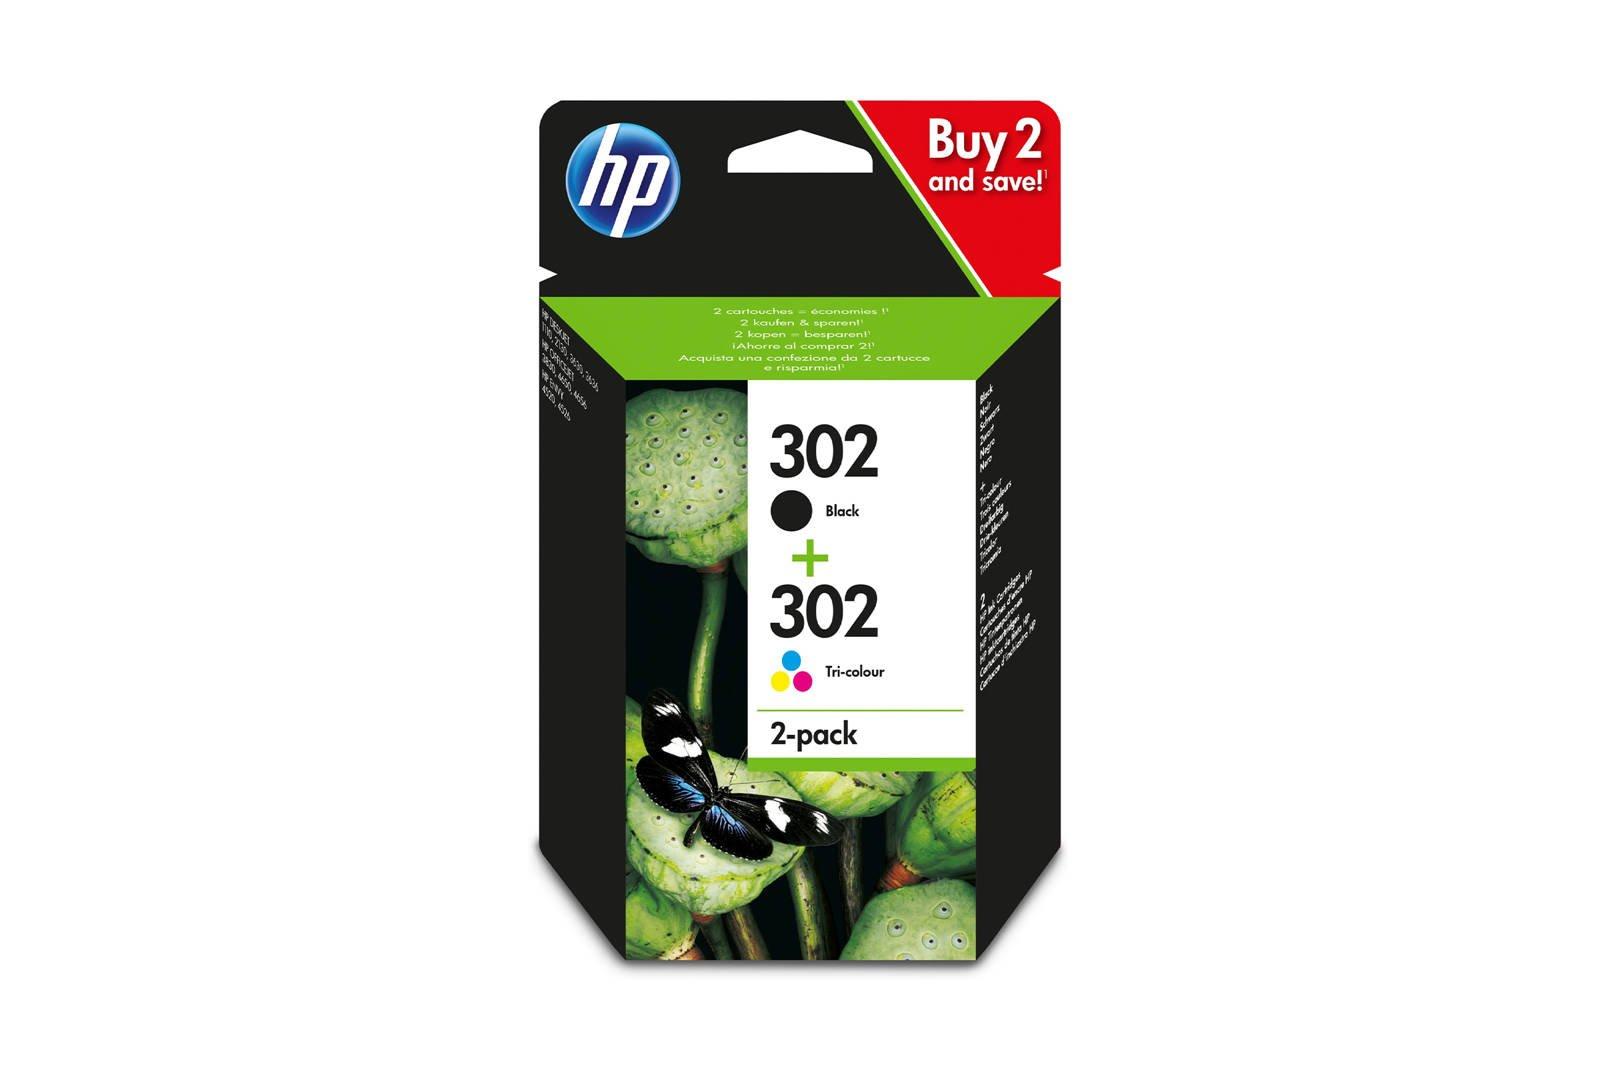 Original ink cartridges HP 302 X4D37AE Black + Color